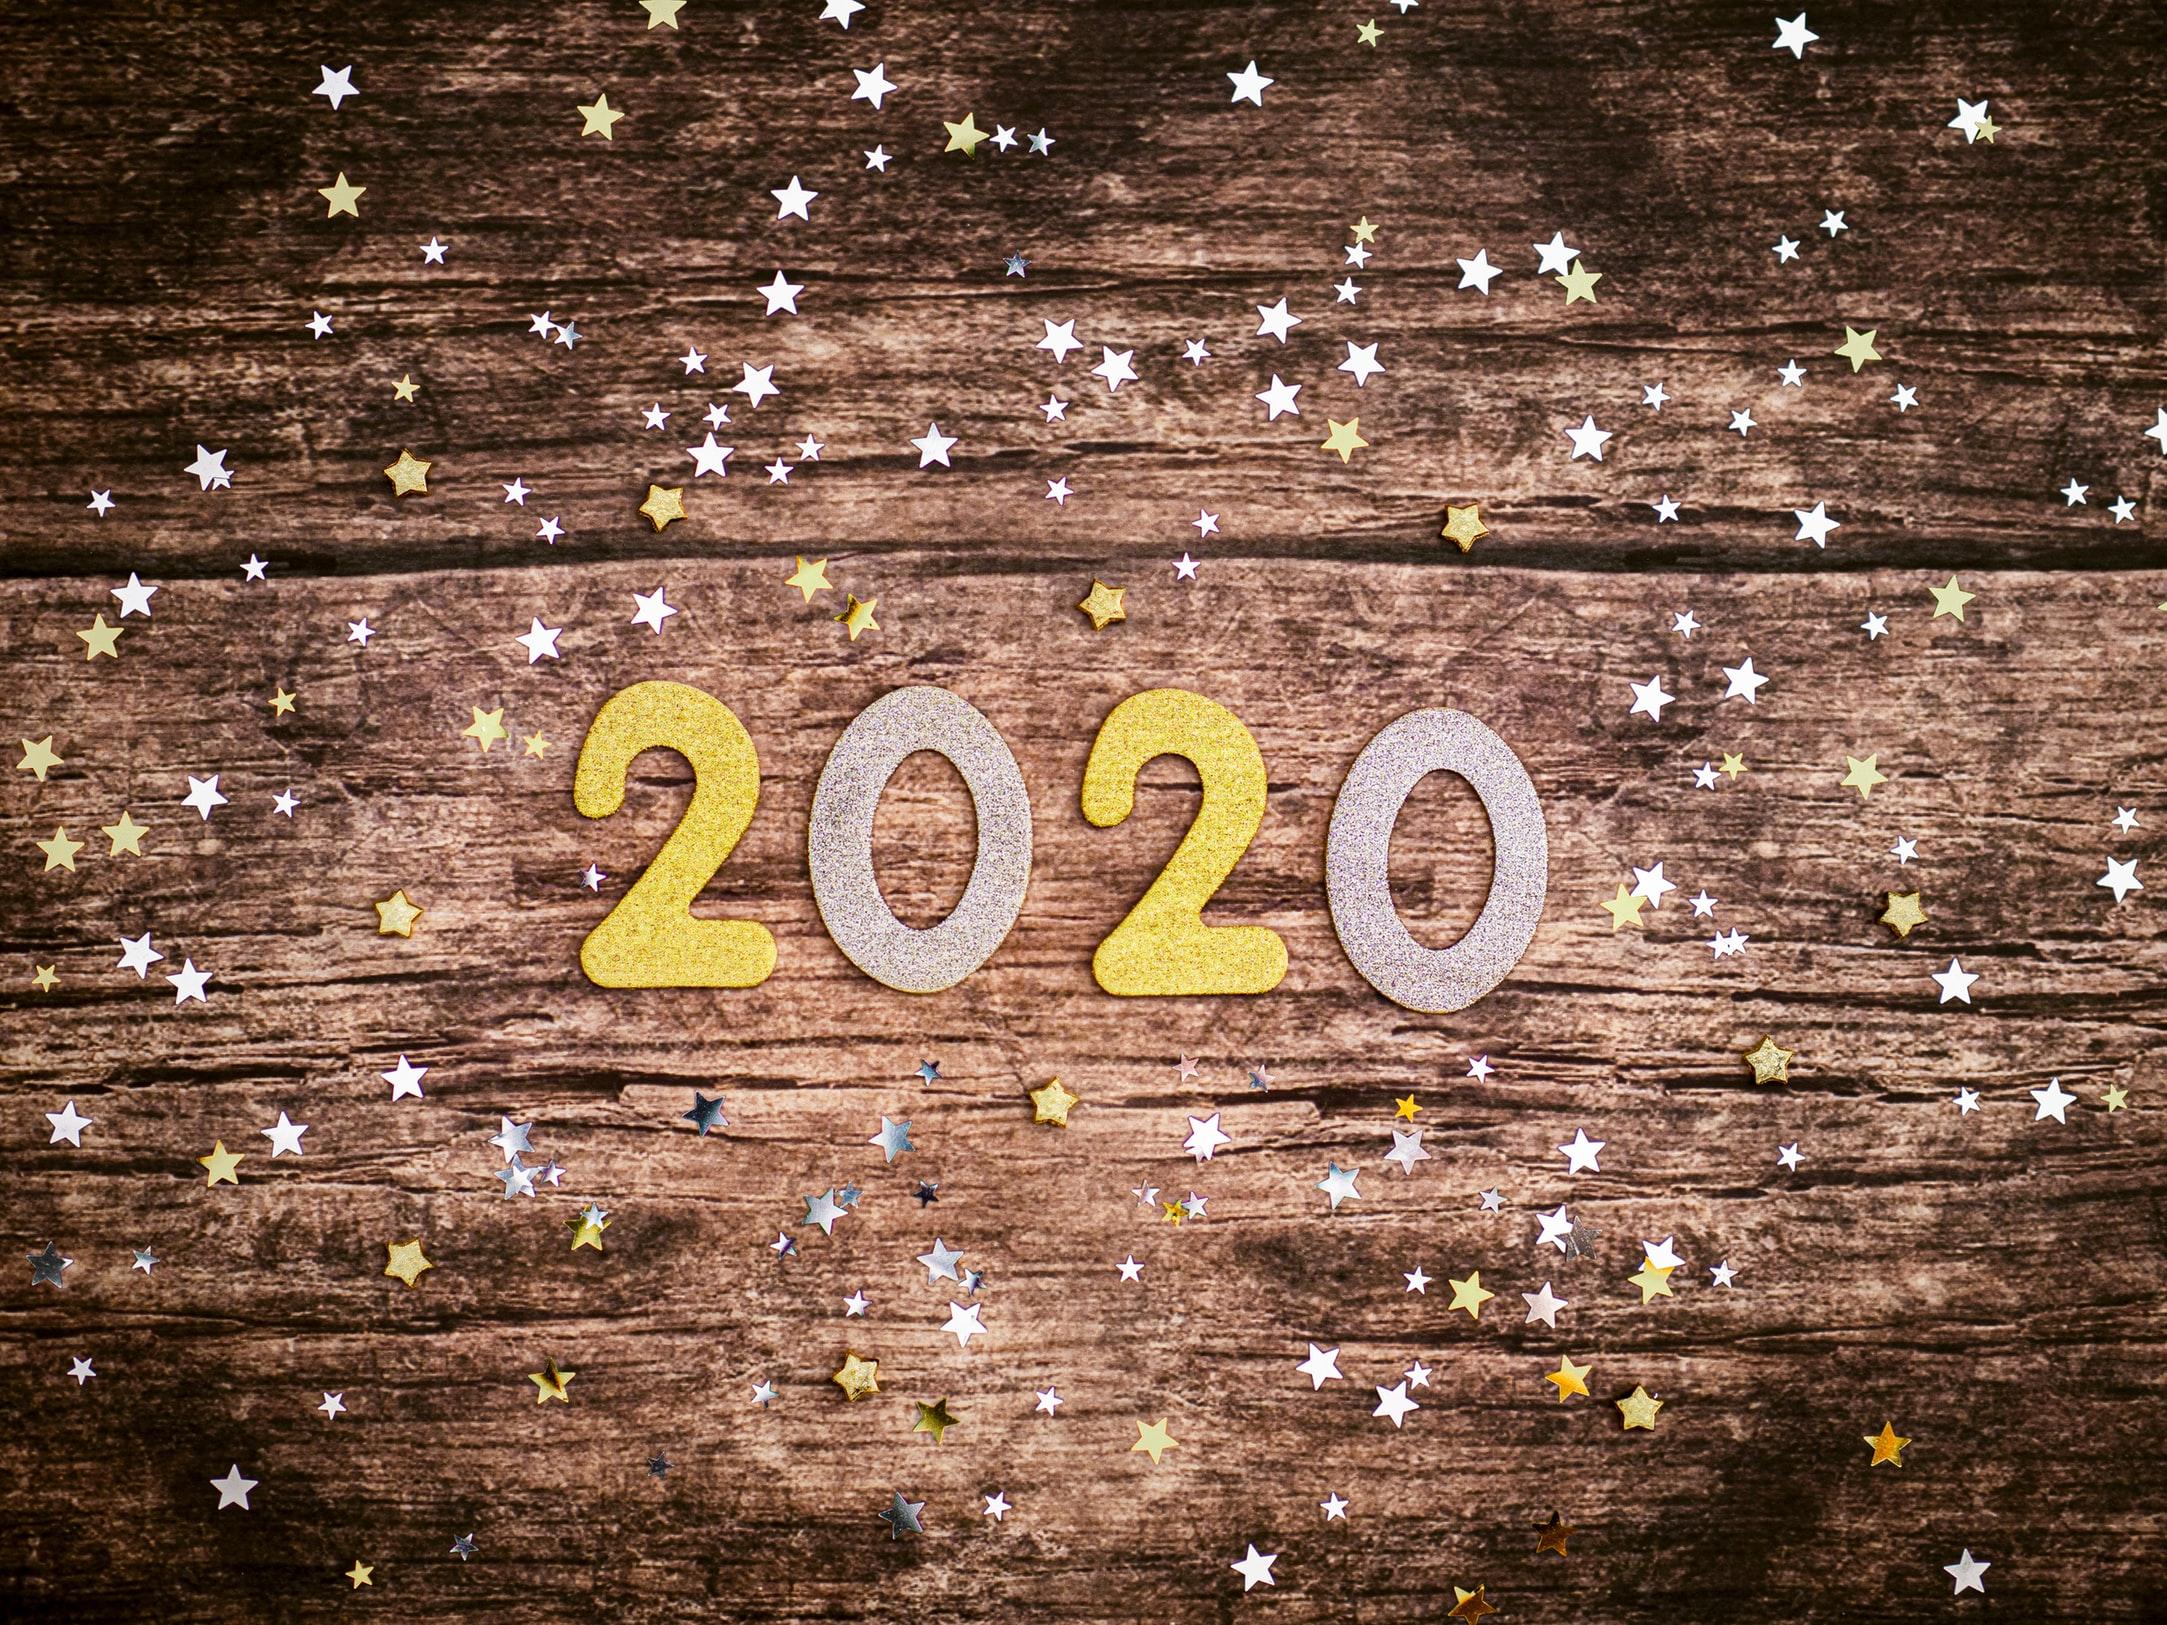 2020 Fitness Trends Surveys: Was I Right?